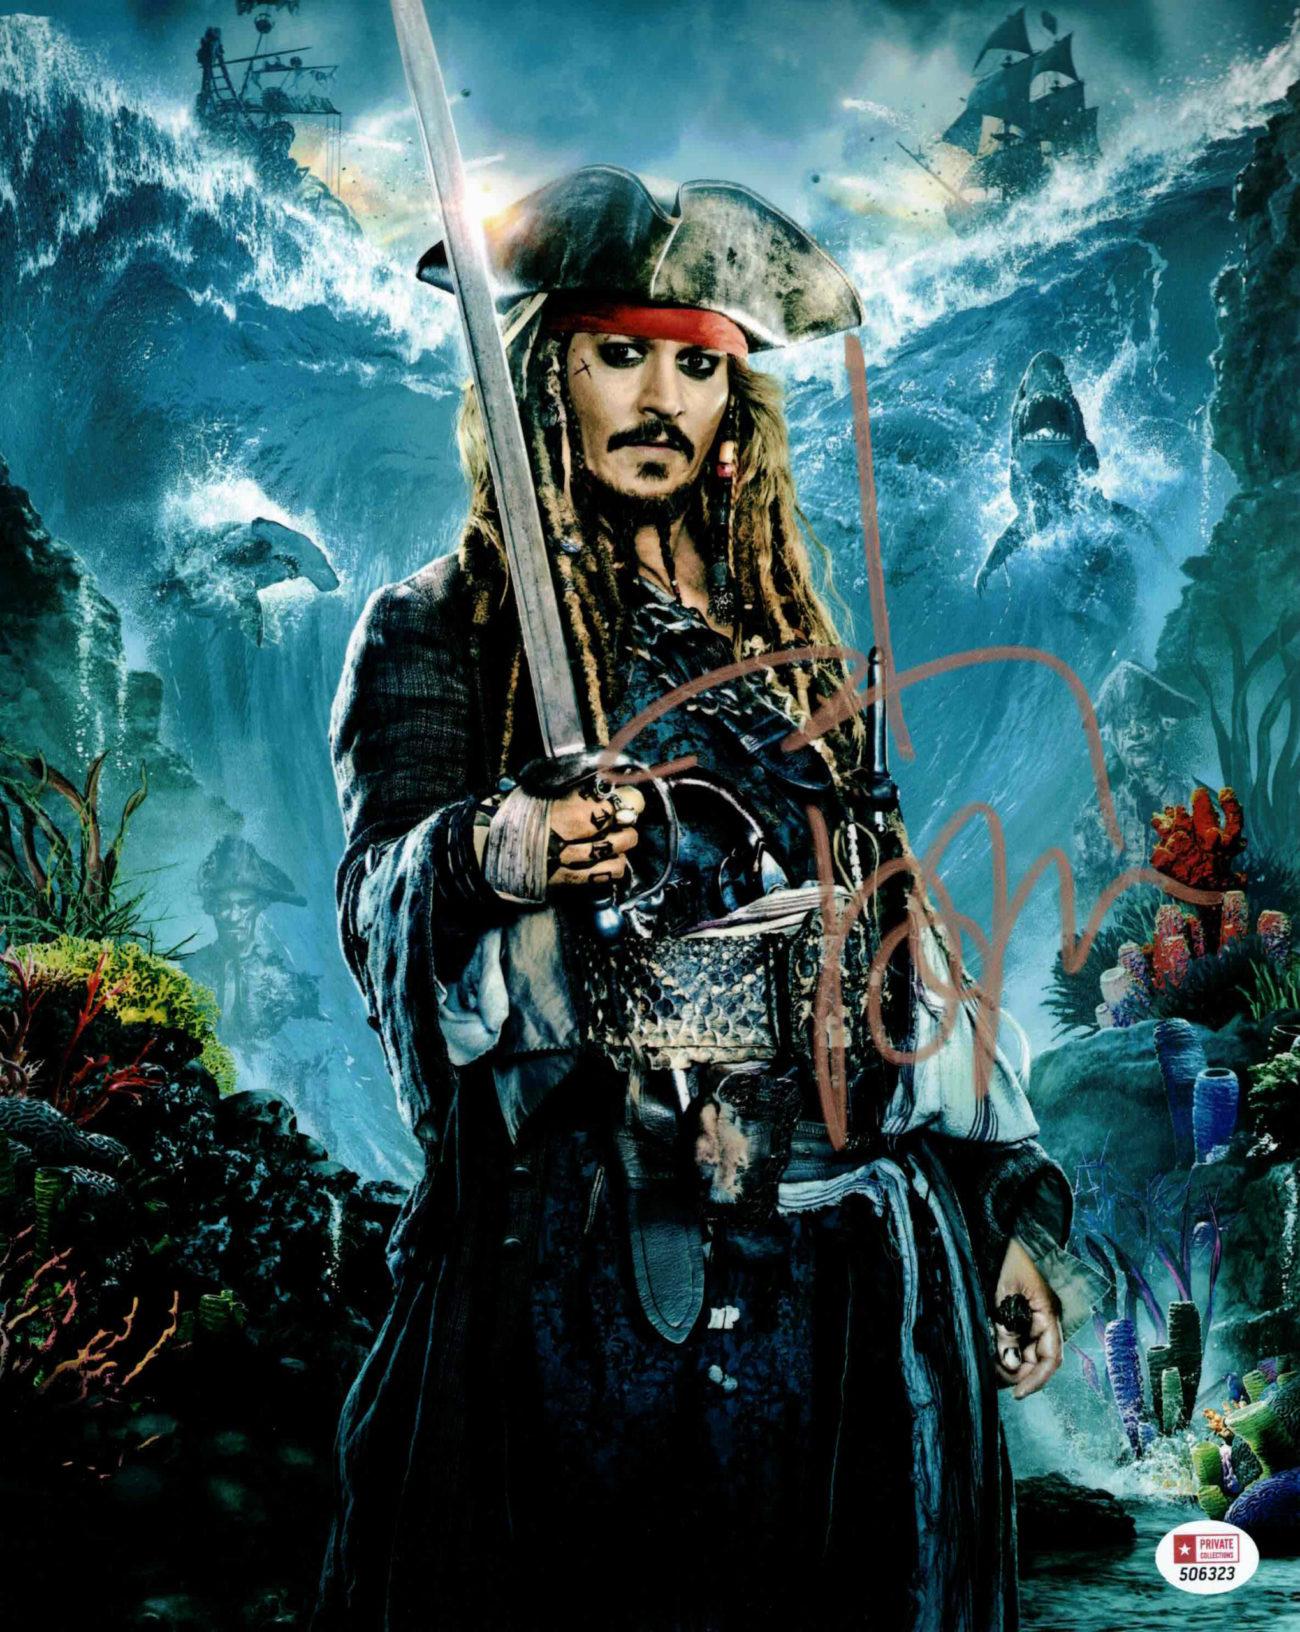 Johnny Depp / Jack Sparrow, Piráti z Karibiku - autogram